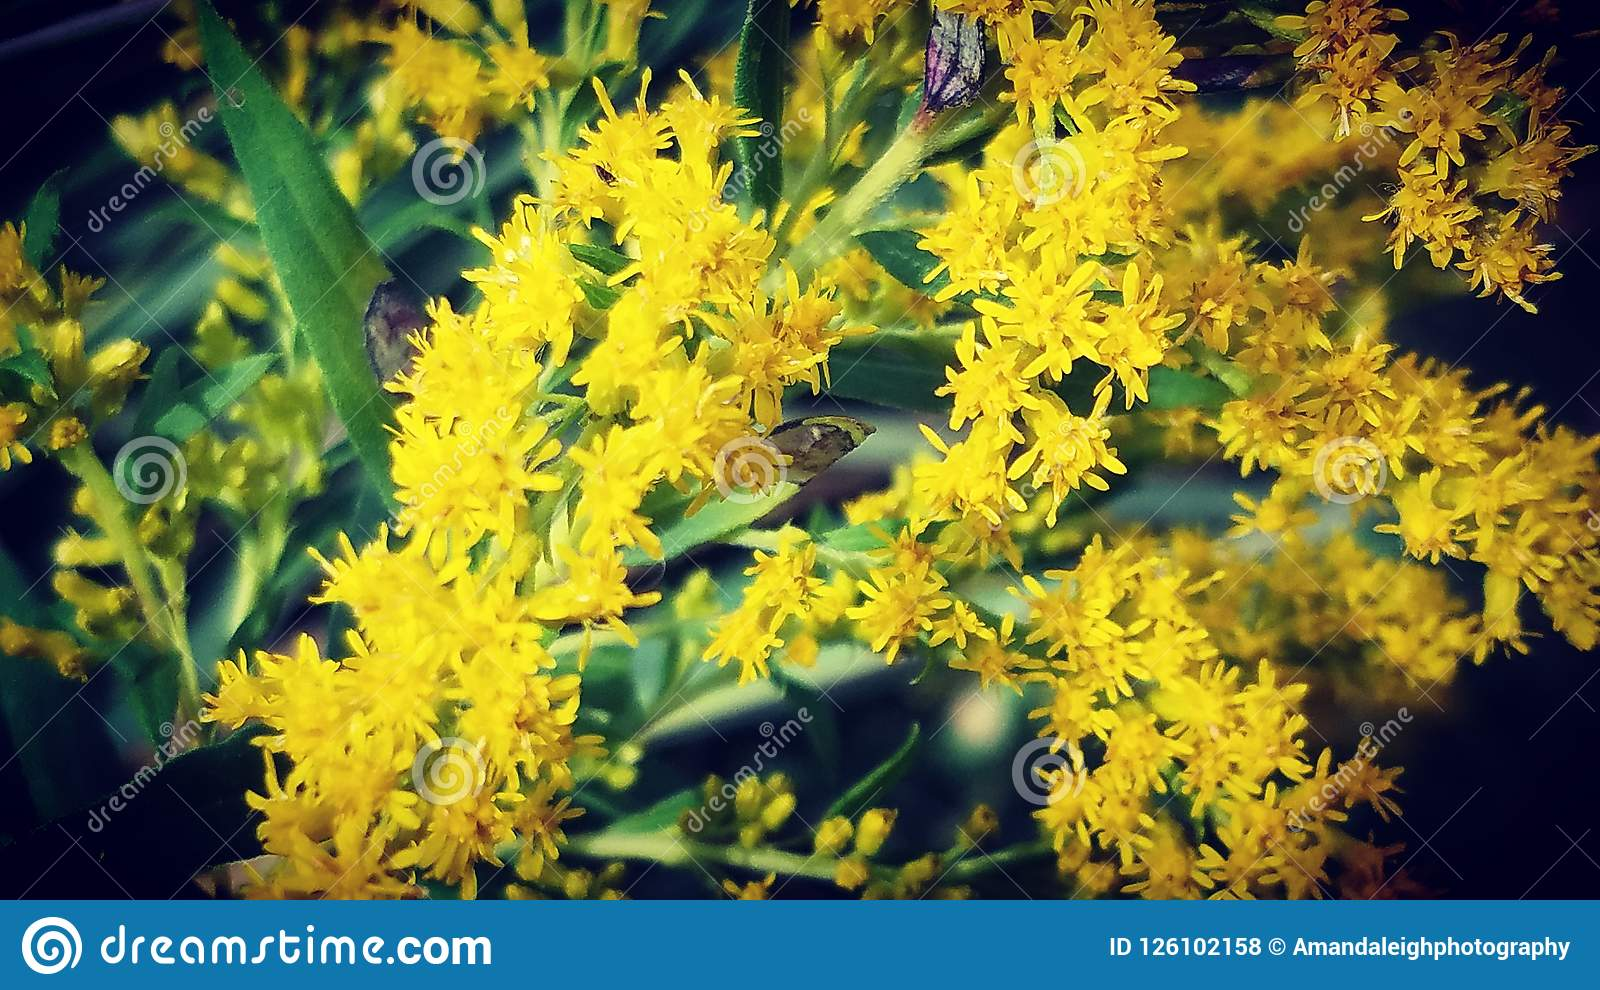 Yellows Stock Photo Image Of Flowers Yellow Yellows 126102158